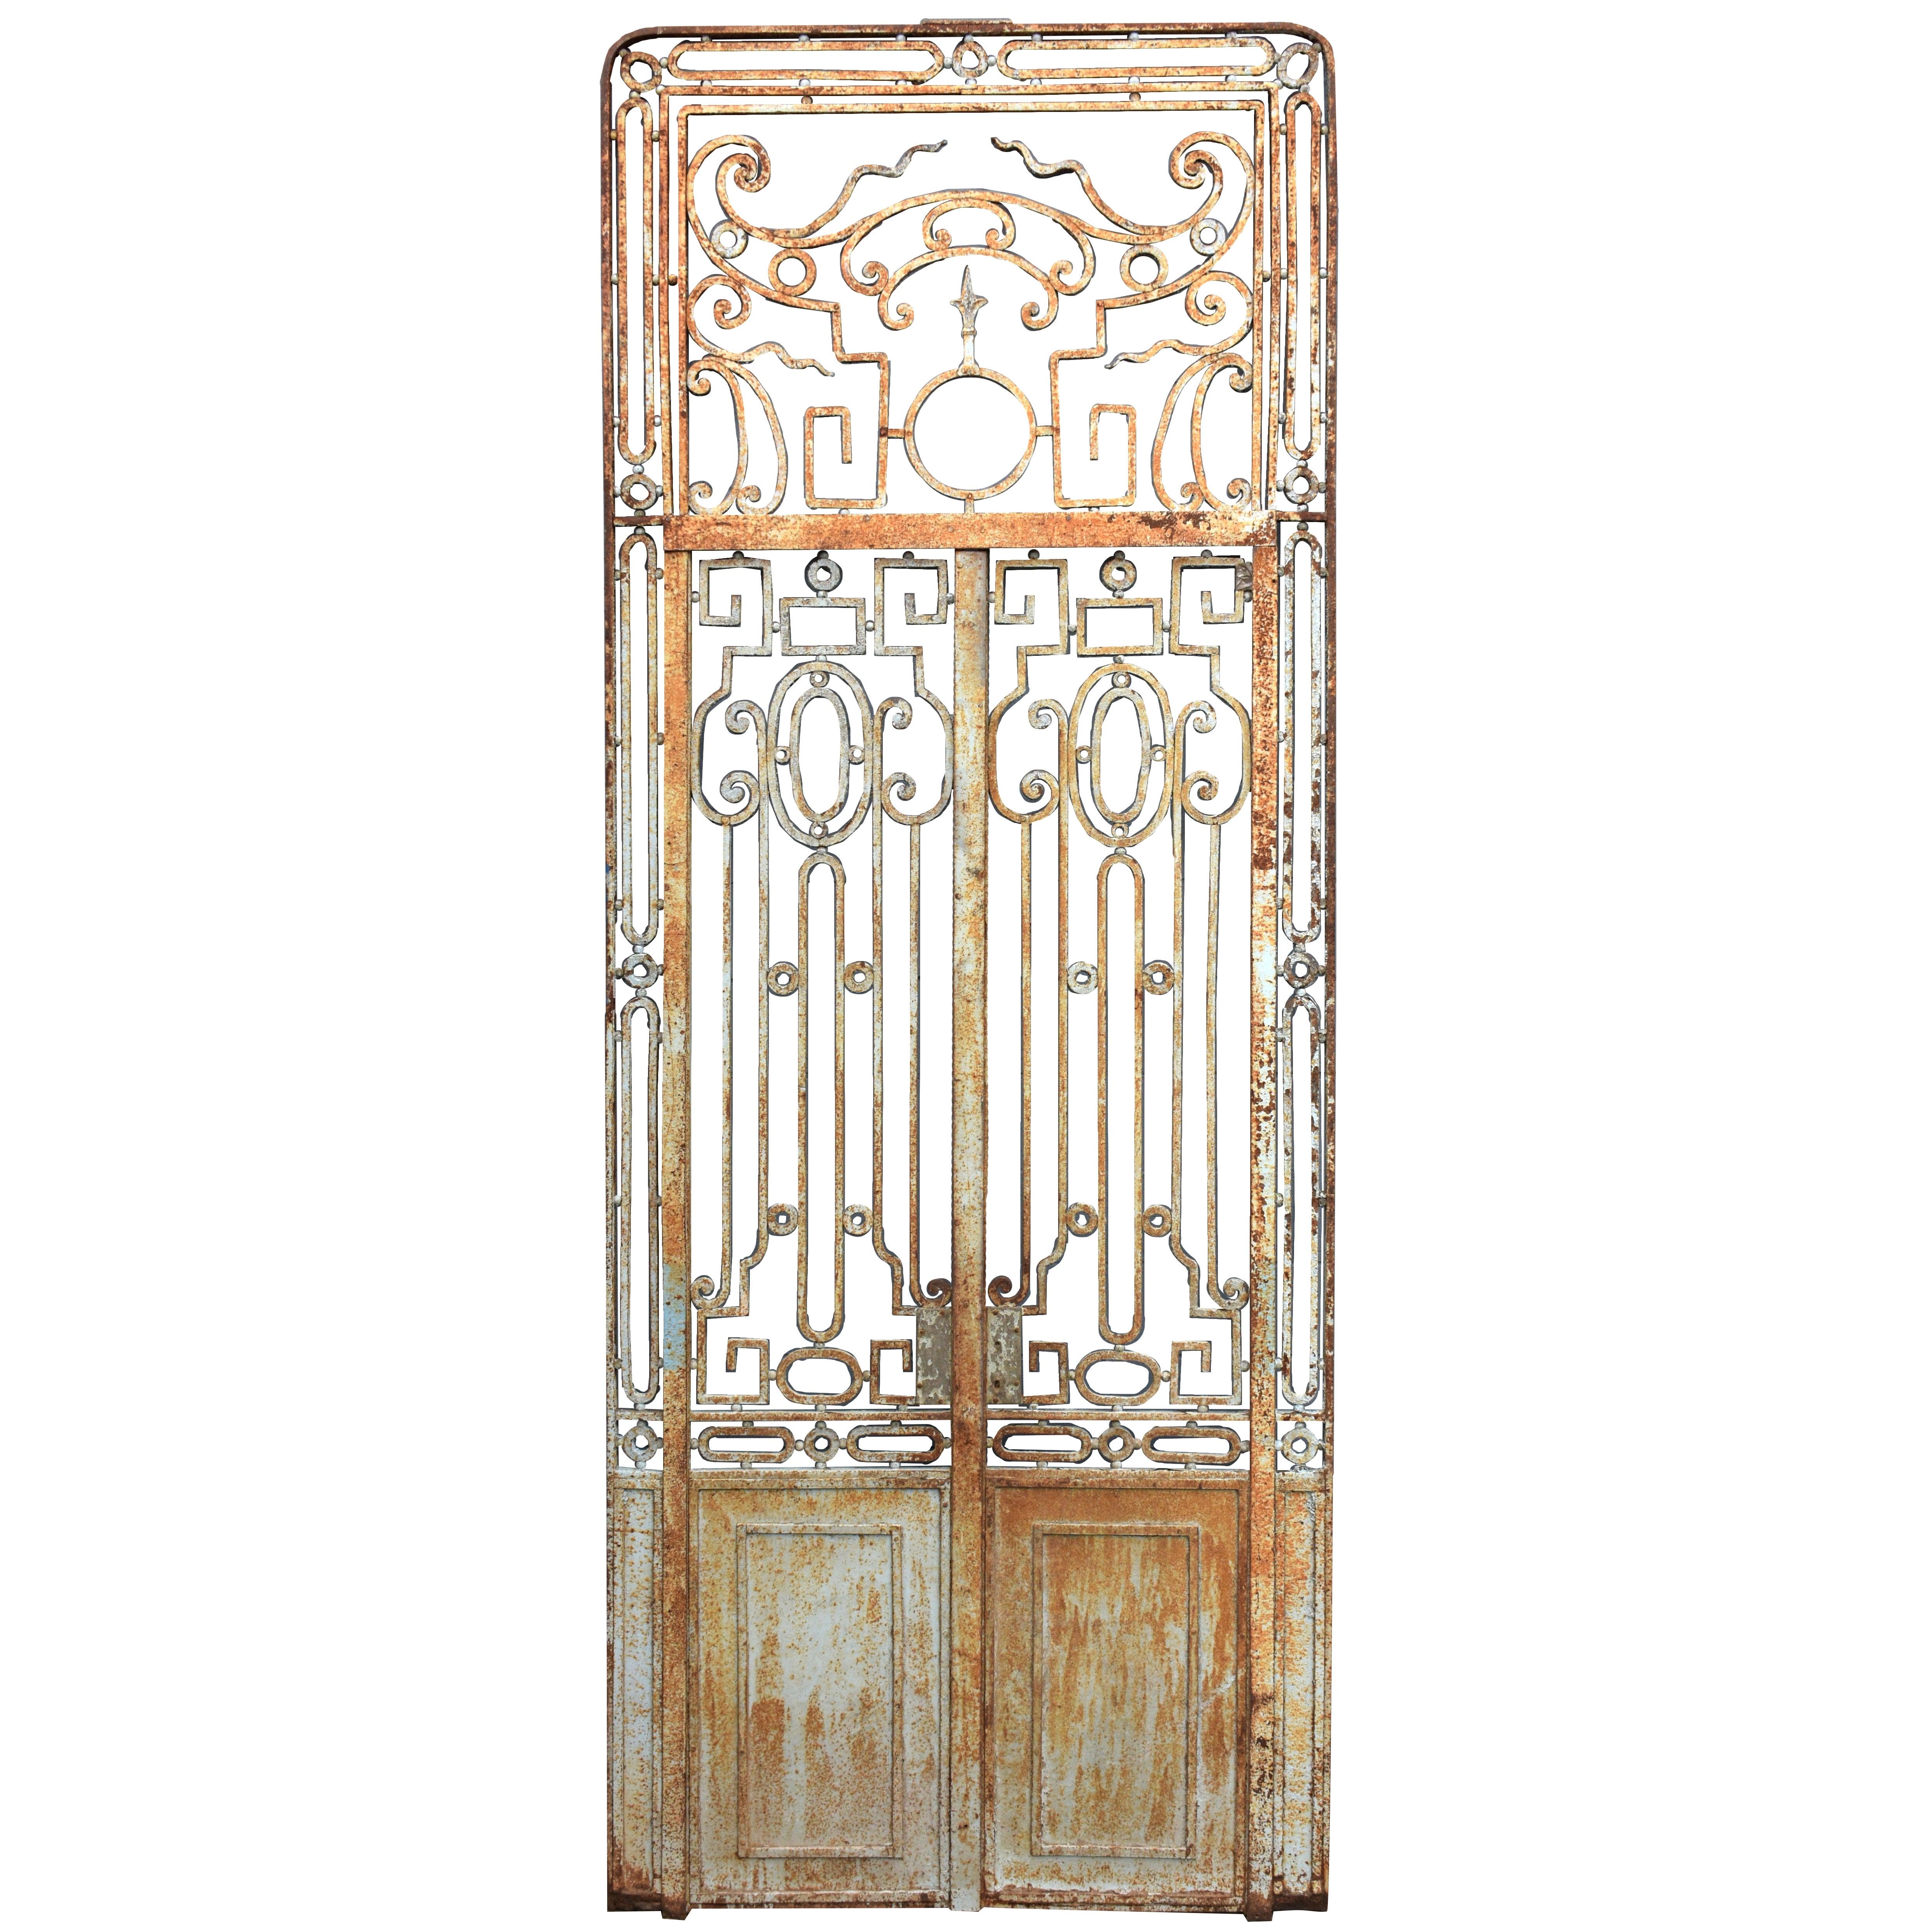 Antique Large Wrought Iron Gate Doors